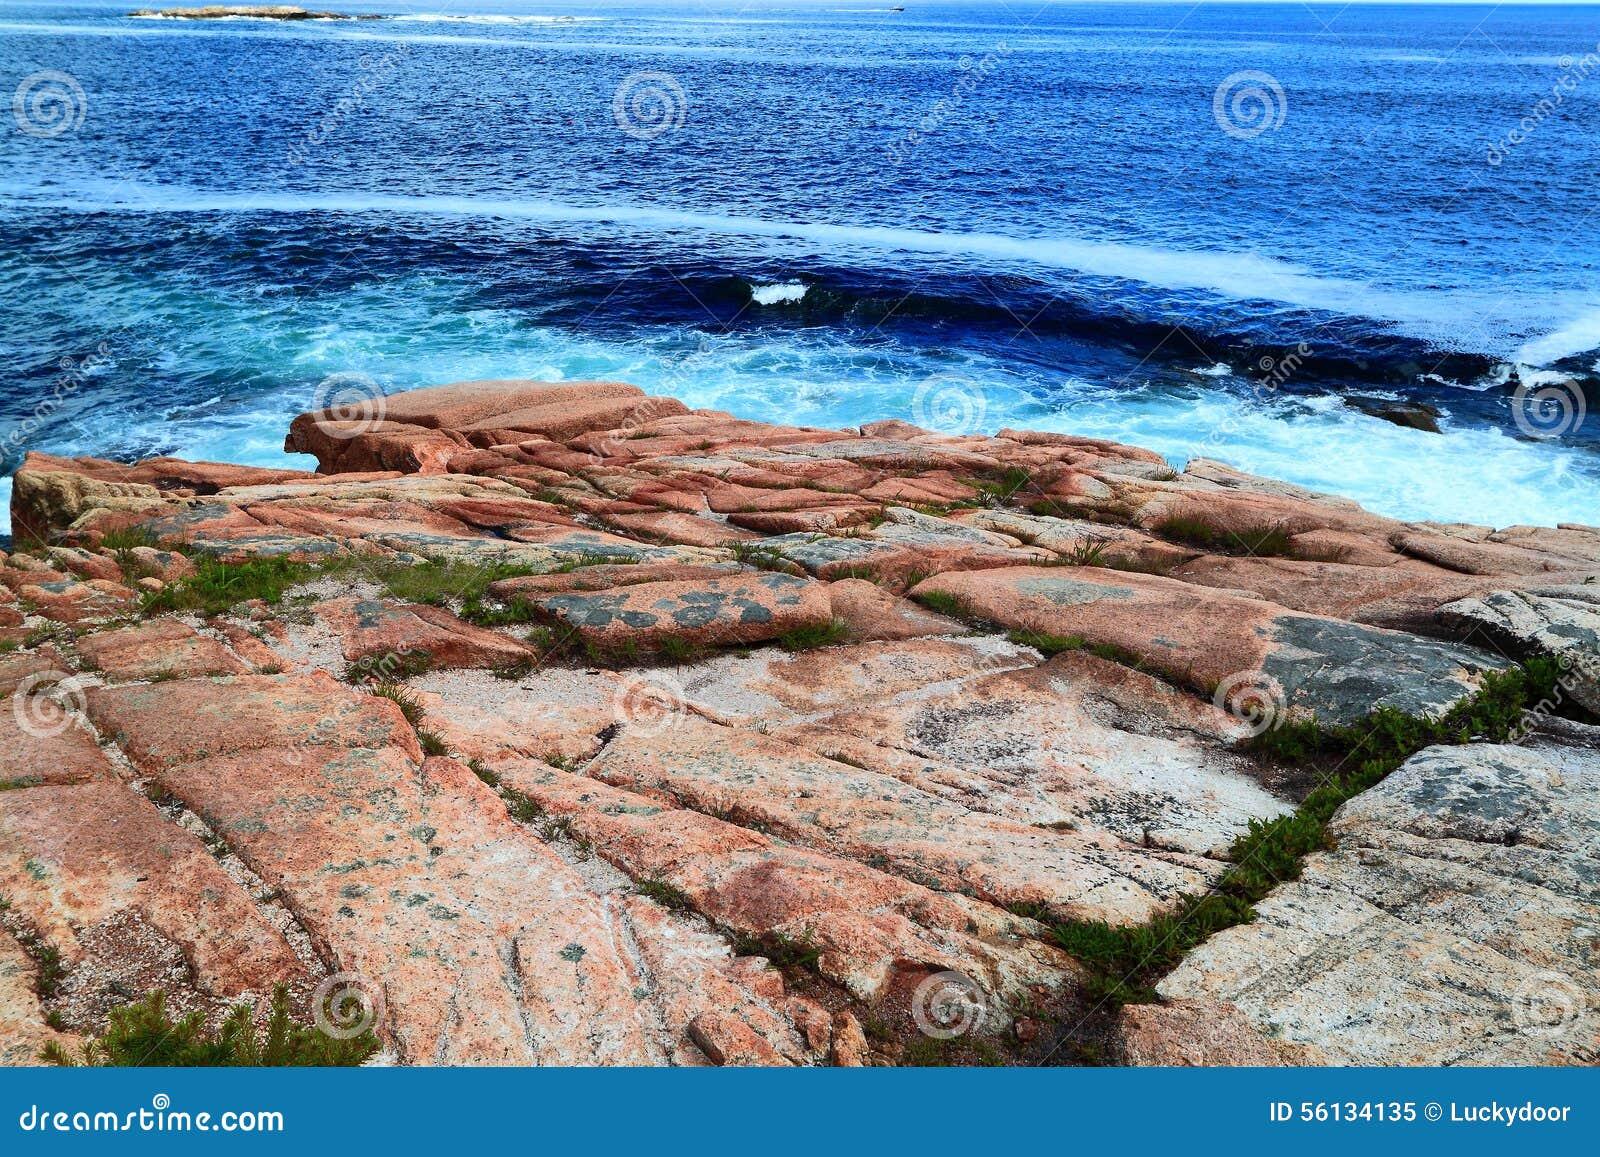 2 with Stock Photo Coastal Rock Ocean Wave Maine Atlantic Acadia National Park United States Image56134135 on Pendula also Index likewise Cf39666b98f32086 Maine Coast Cottage Maine Cottages On The Ocean likewise Stories Historytimeline 20ch3 likewise Coastal Maine Best Beaches.